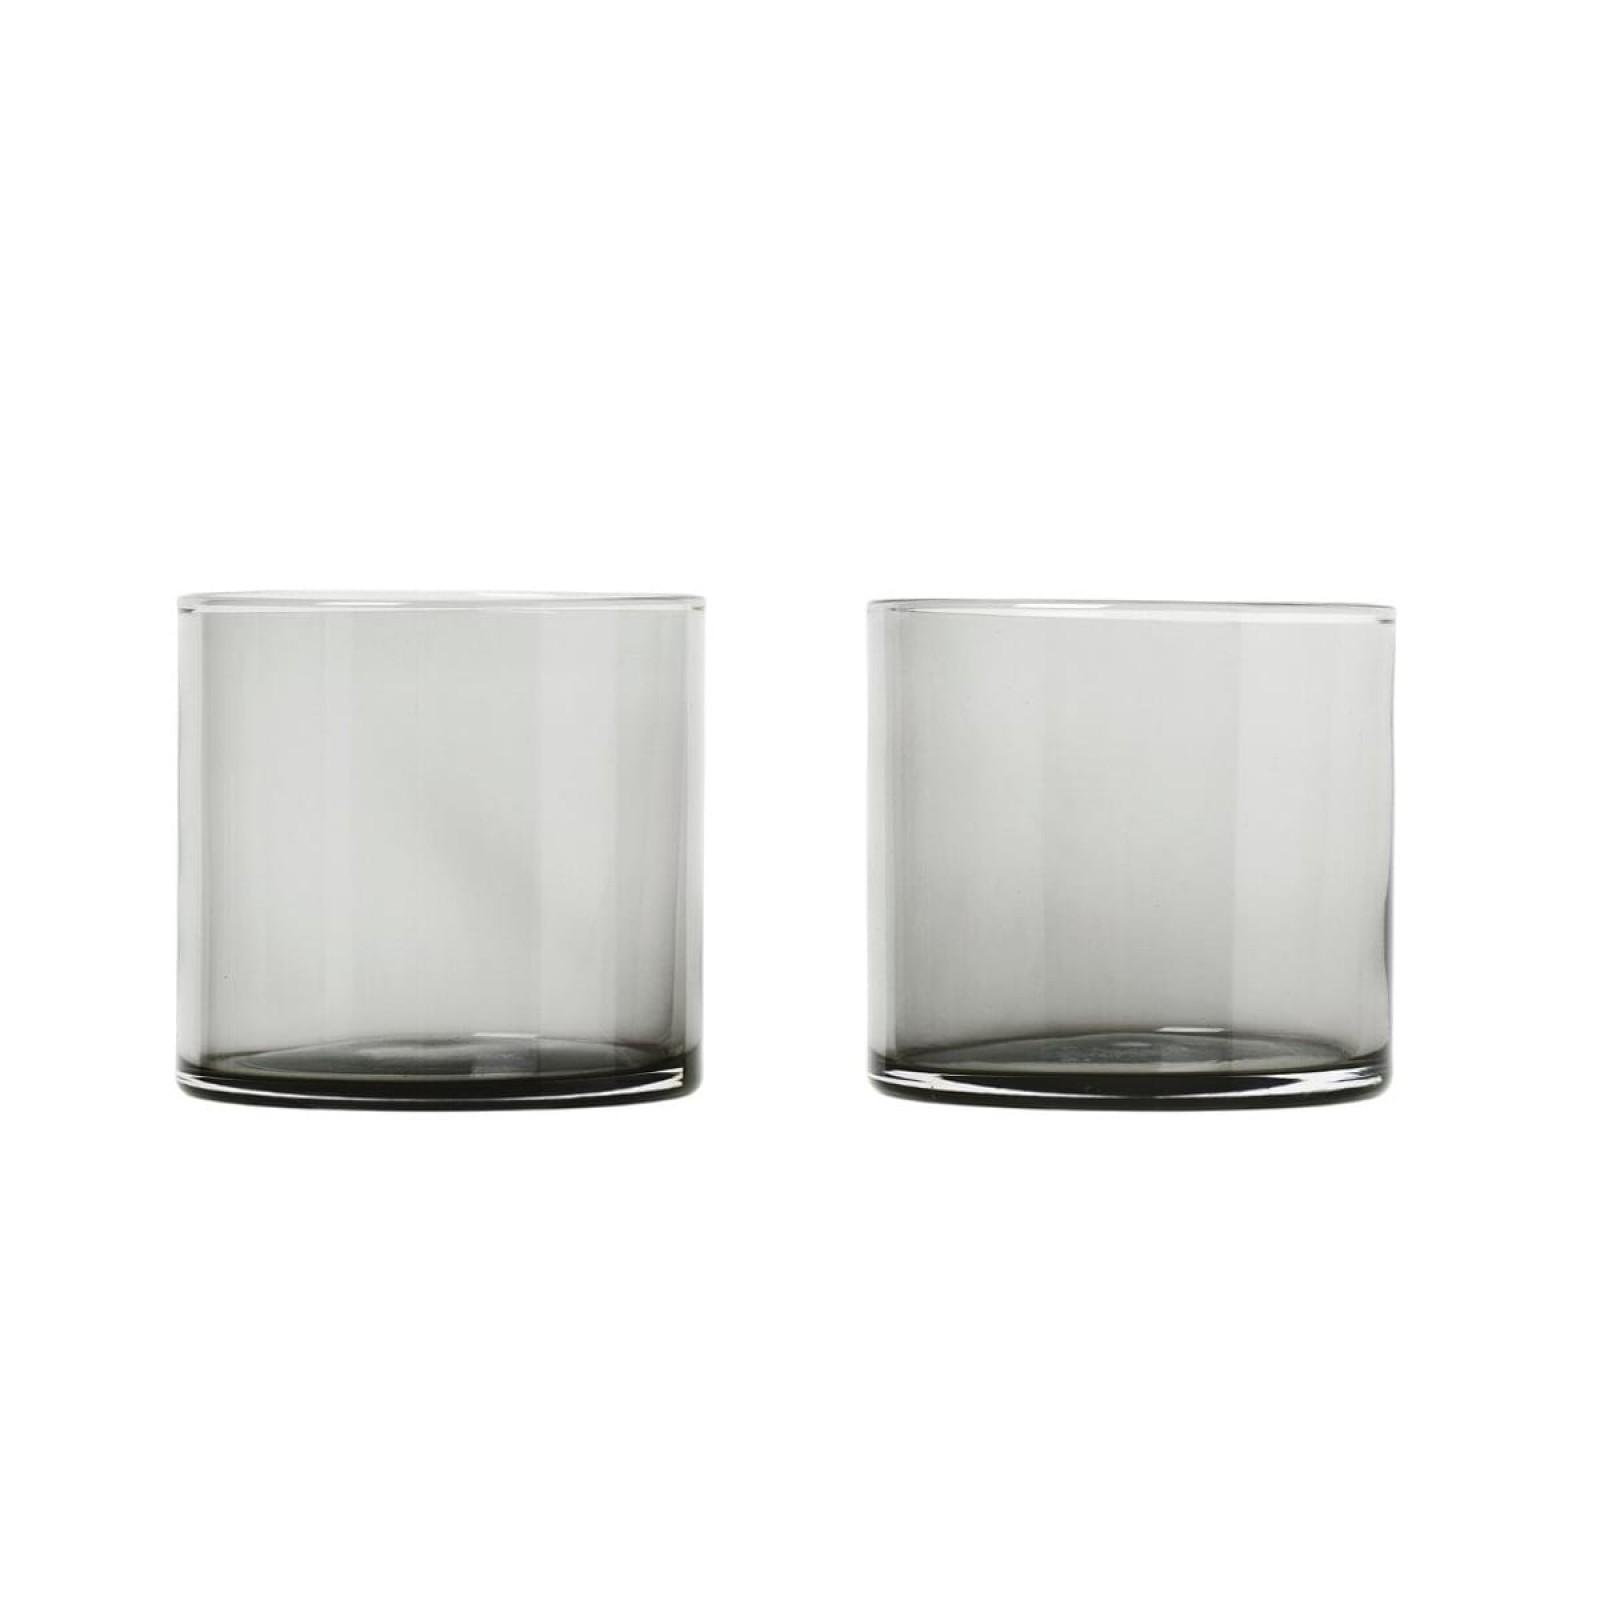 MERA Set of 2 Tumblers 200ml Smoke Glass - Blomus